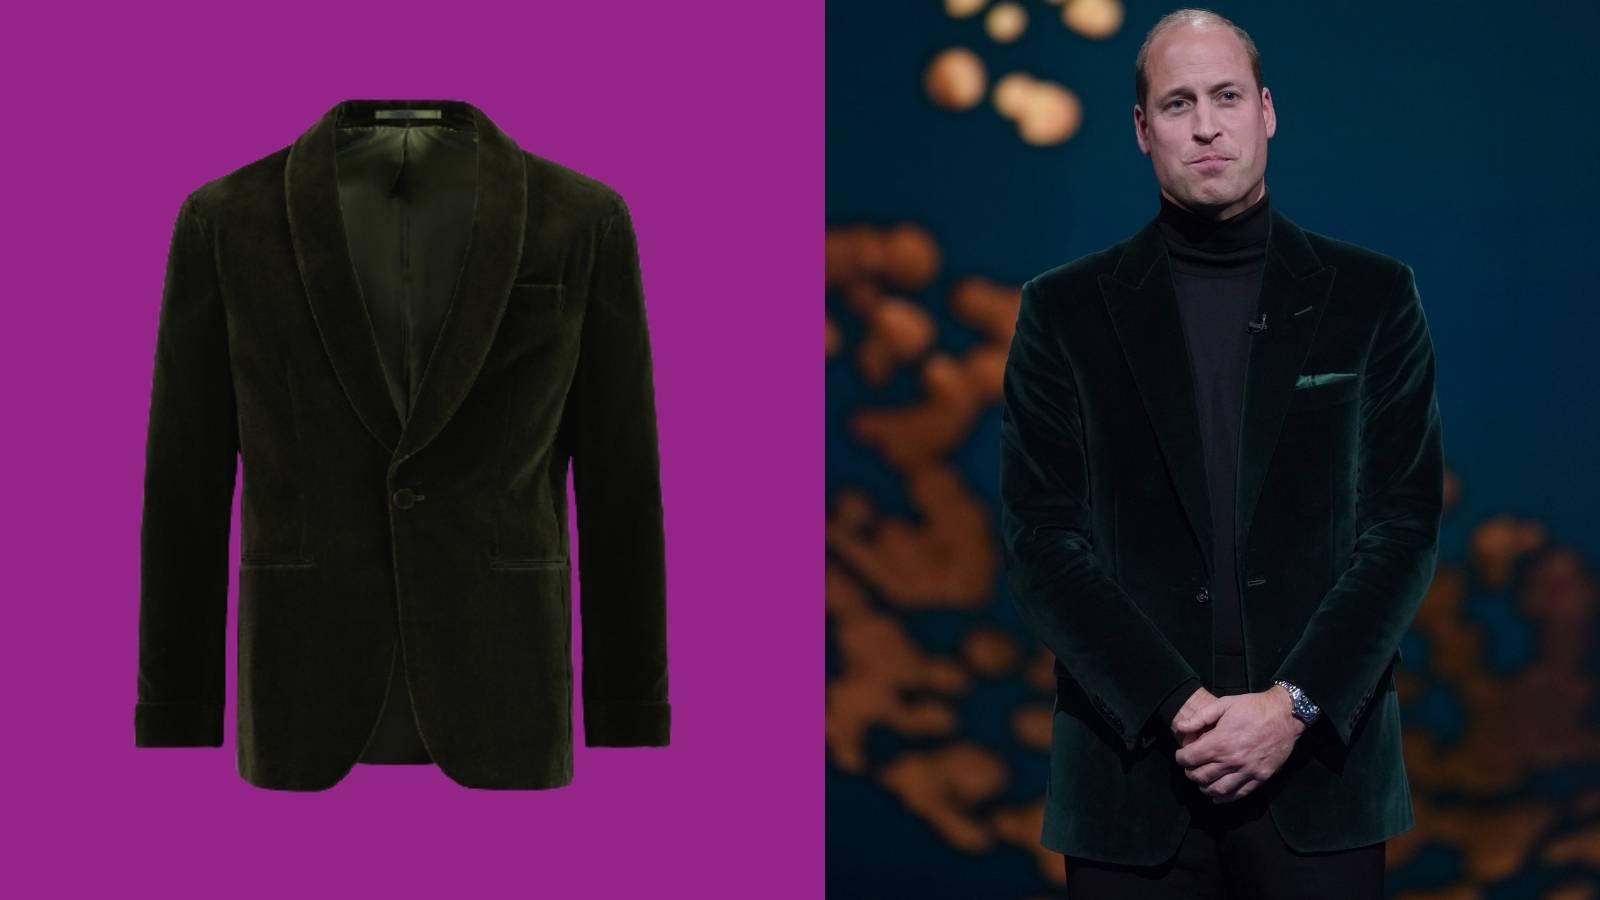 What on earth inspired Prince William's 'green' velvet jacket?